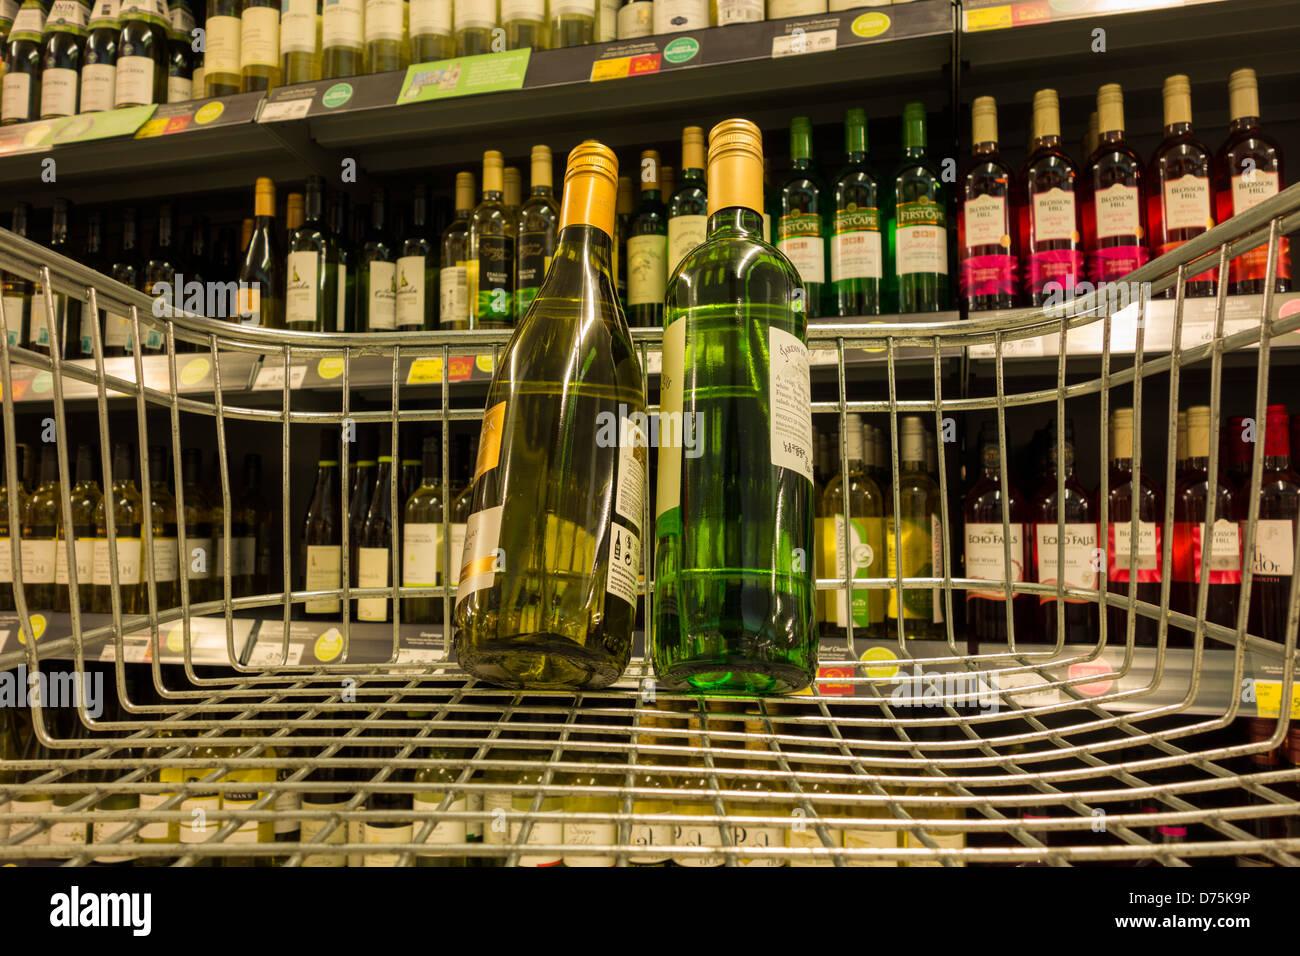 Coldwater Creek Wine Asda